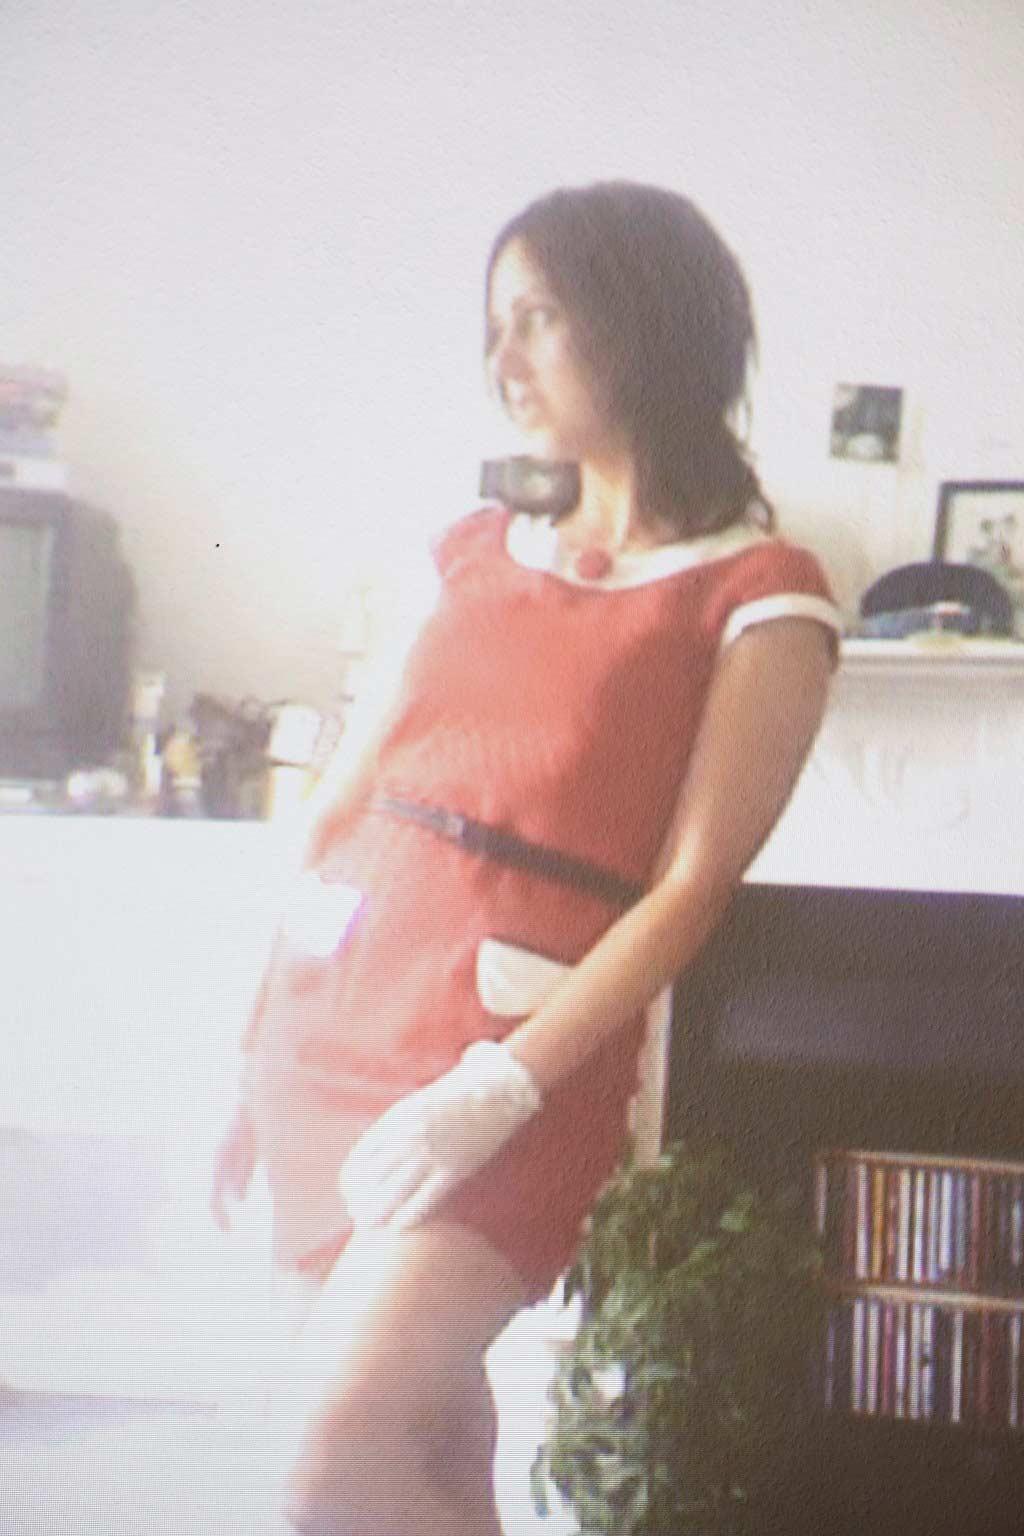 MATILDA, 29, LONDON, ENGLAND matildatandandand22